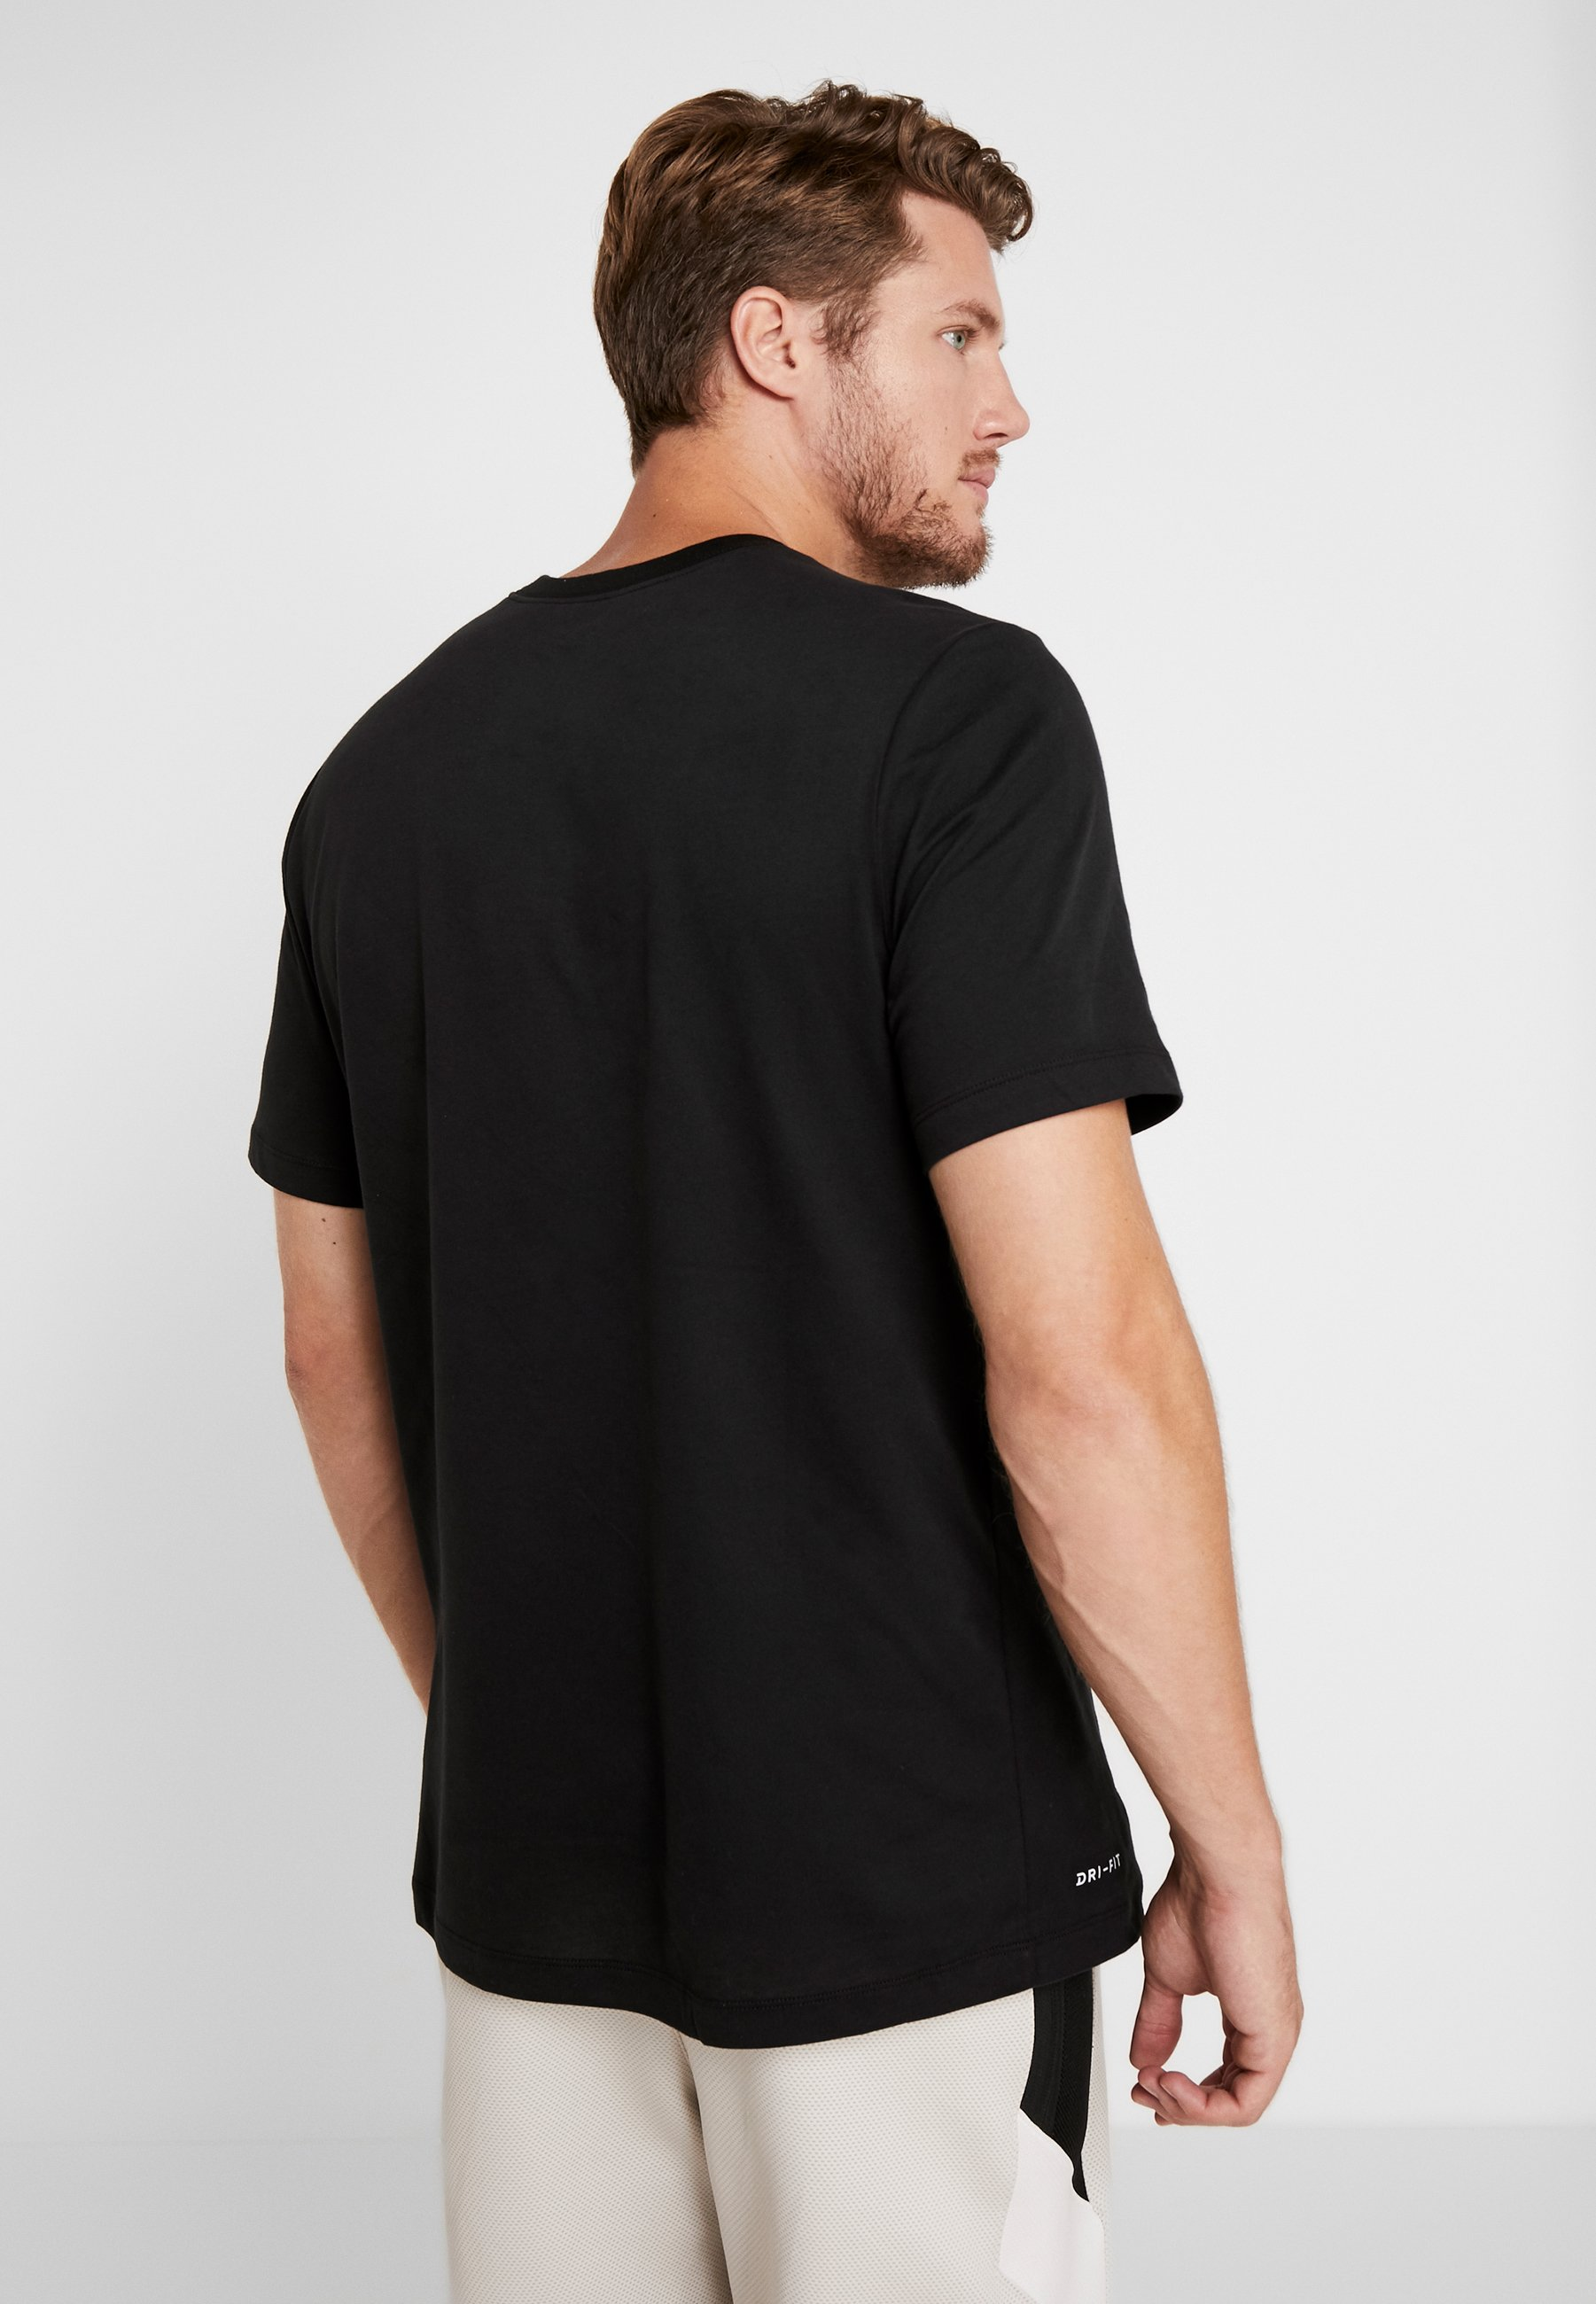 Performance Imprimé white Nike Black Nba shirt TeeT A4jq35RL